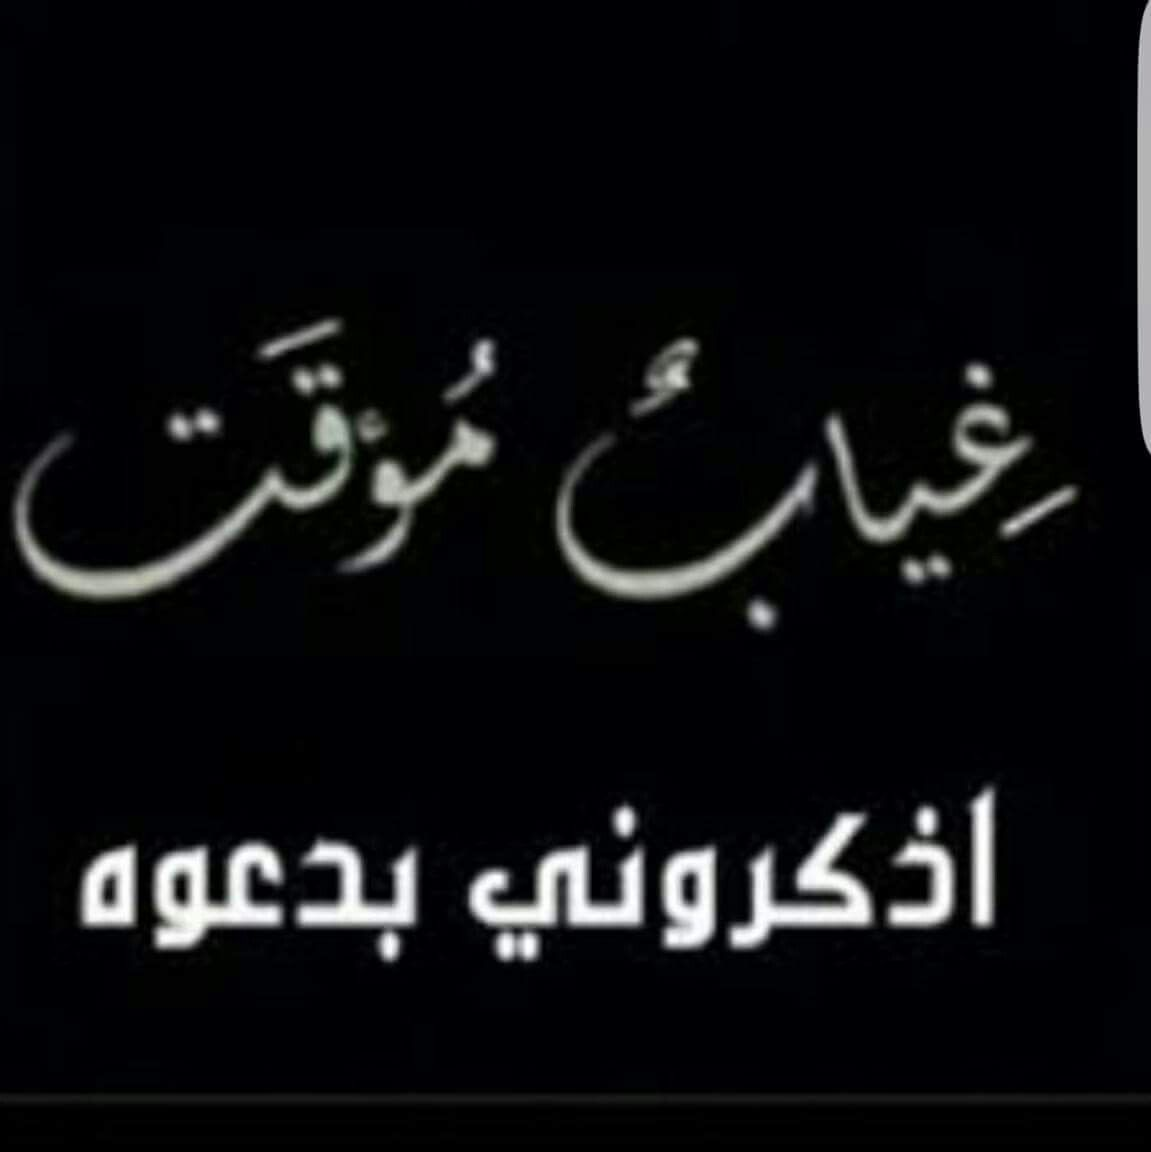 Pin By Gharib Makld On كلمات لها معنى Calligraphy Arabic Calligraphy Arabic